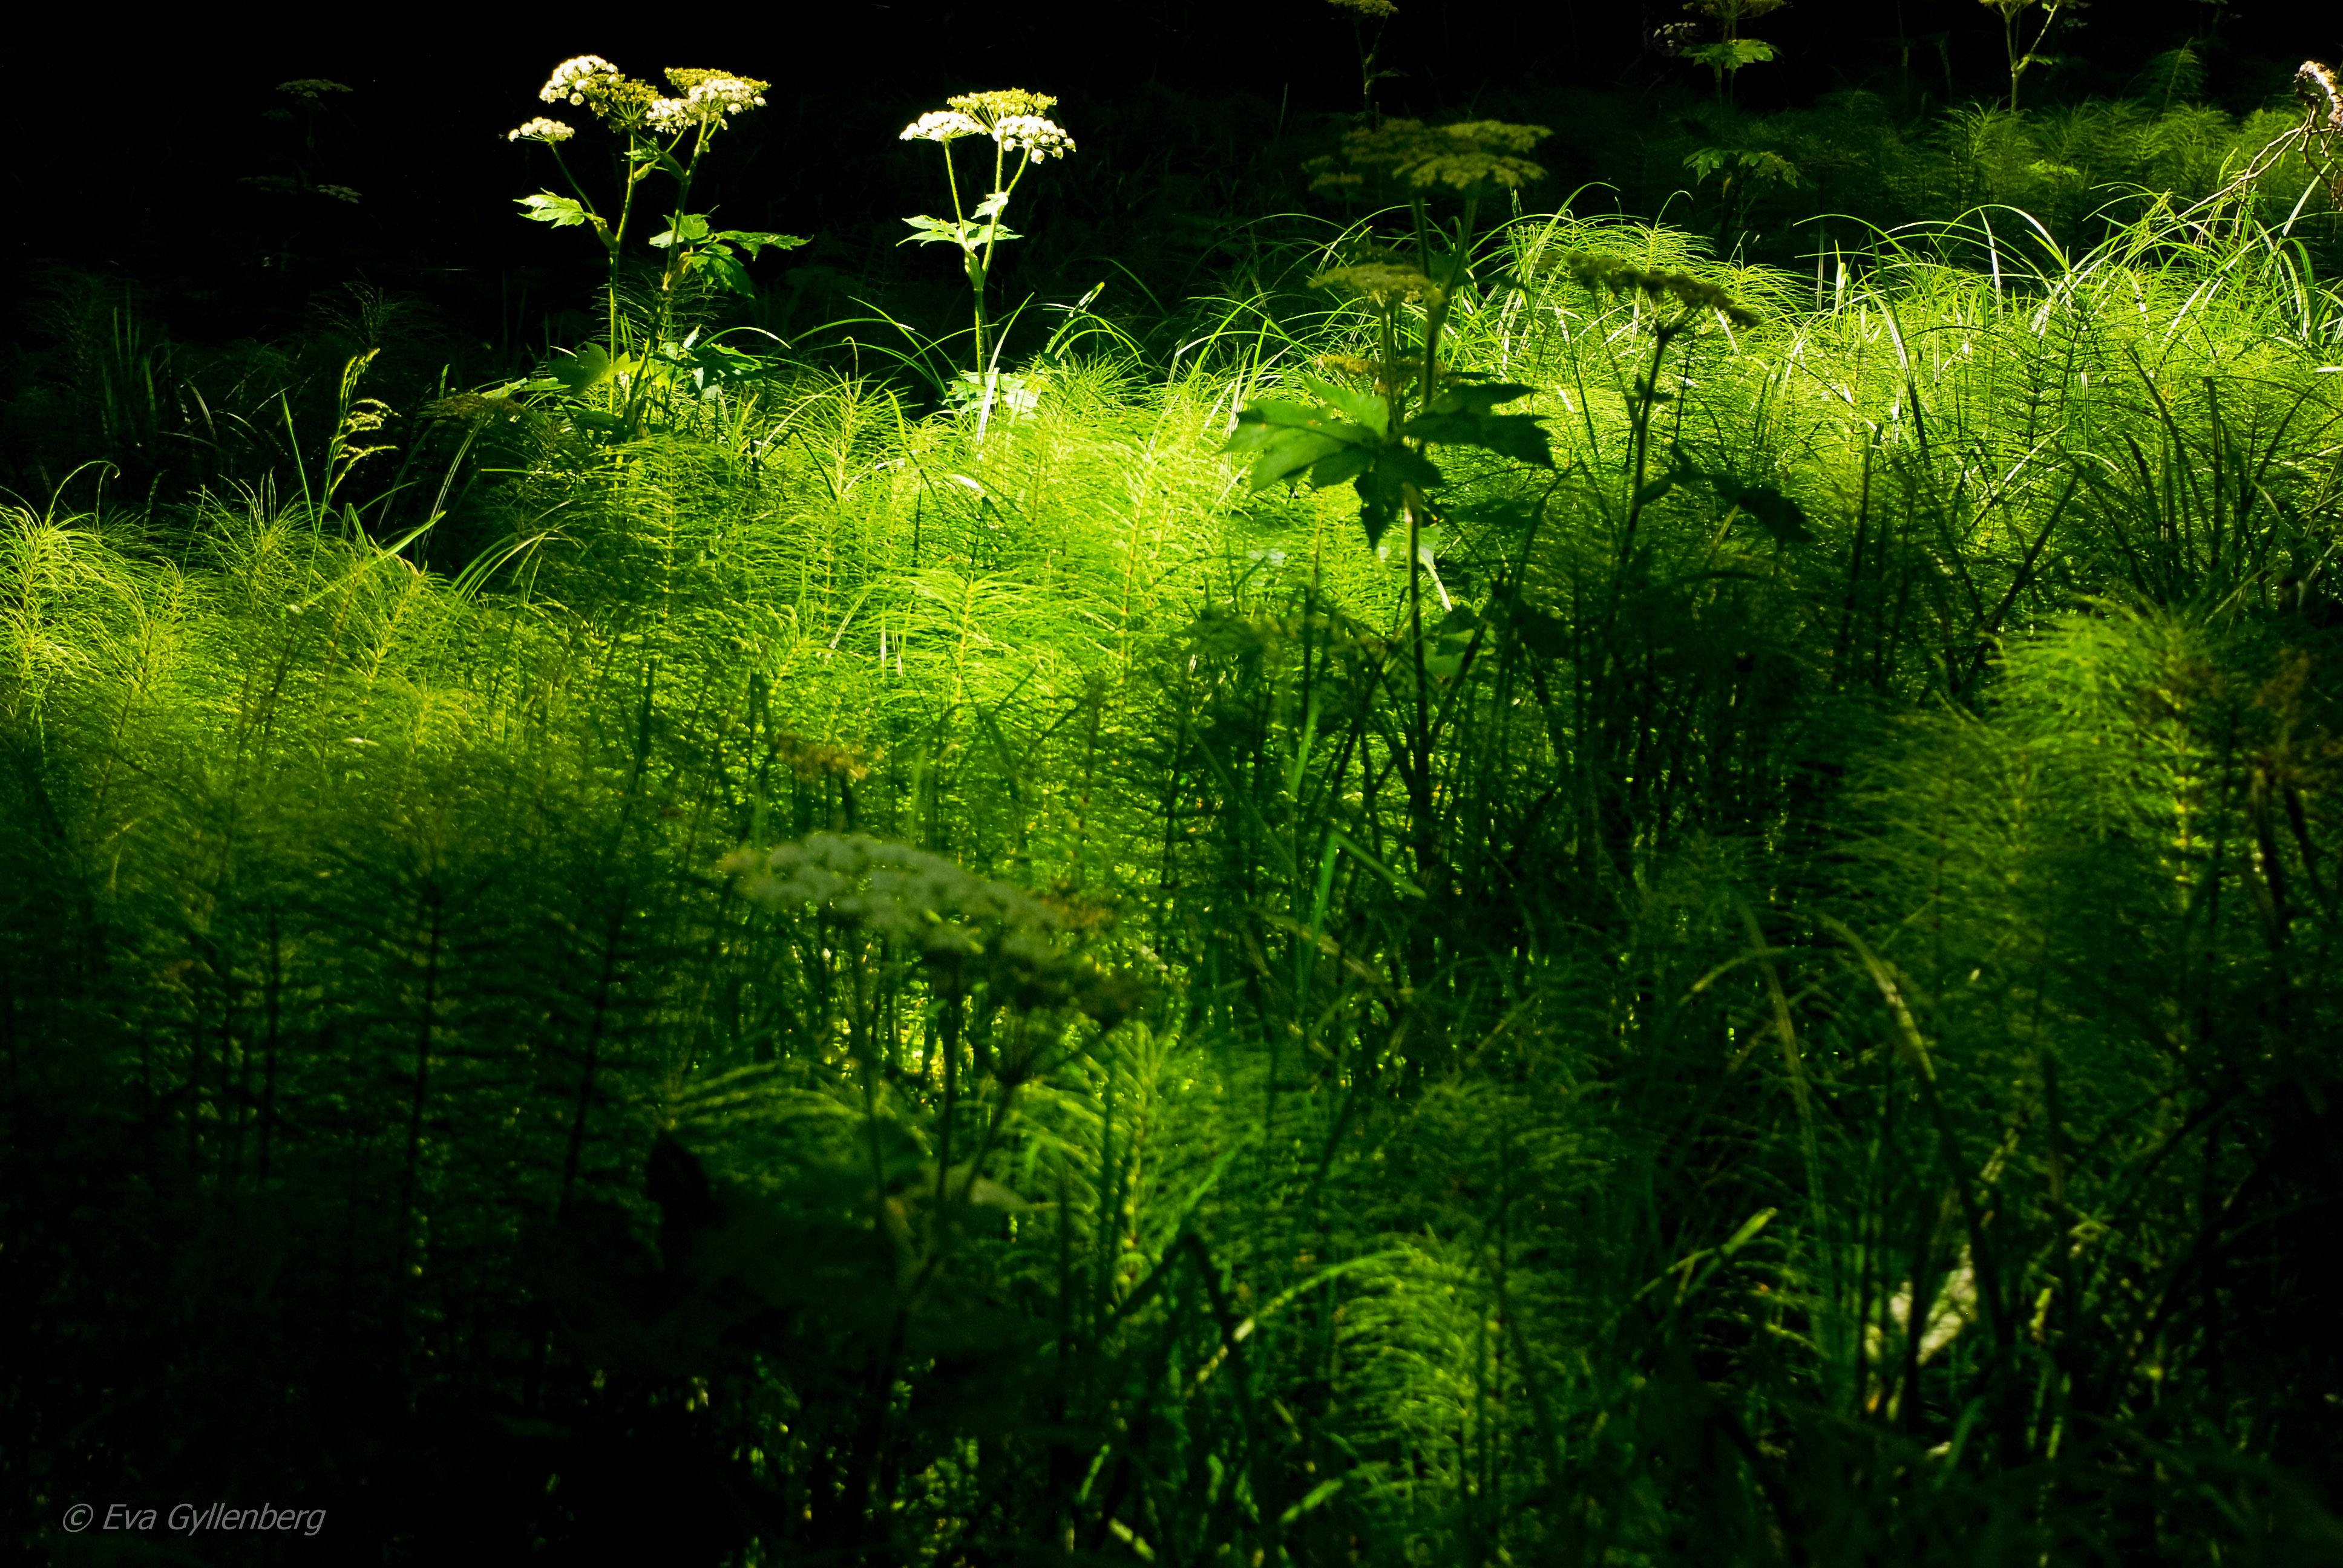 Vårgrönska - Mount Rainier - Washington